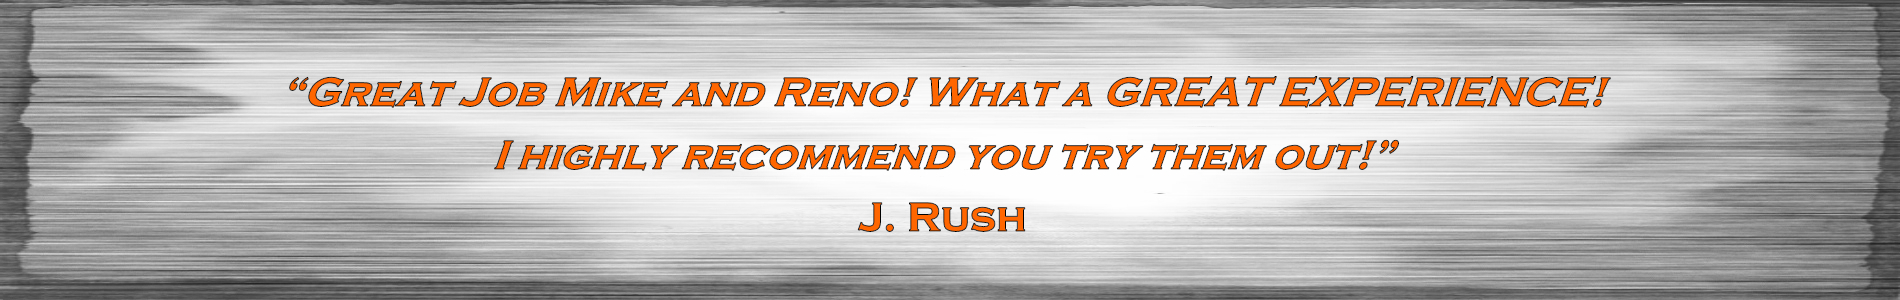 Rush_Testimonial